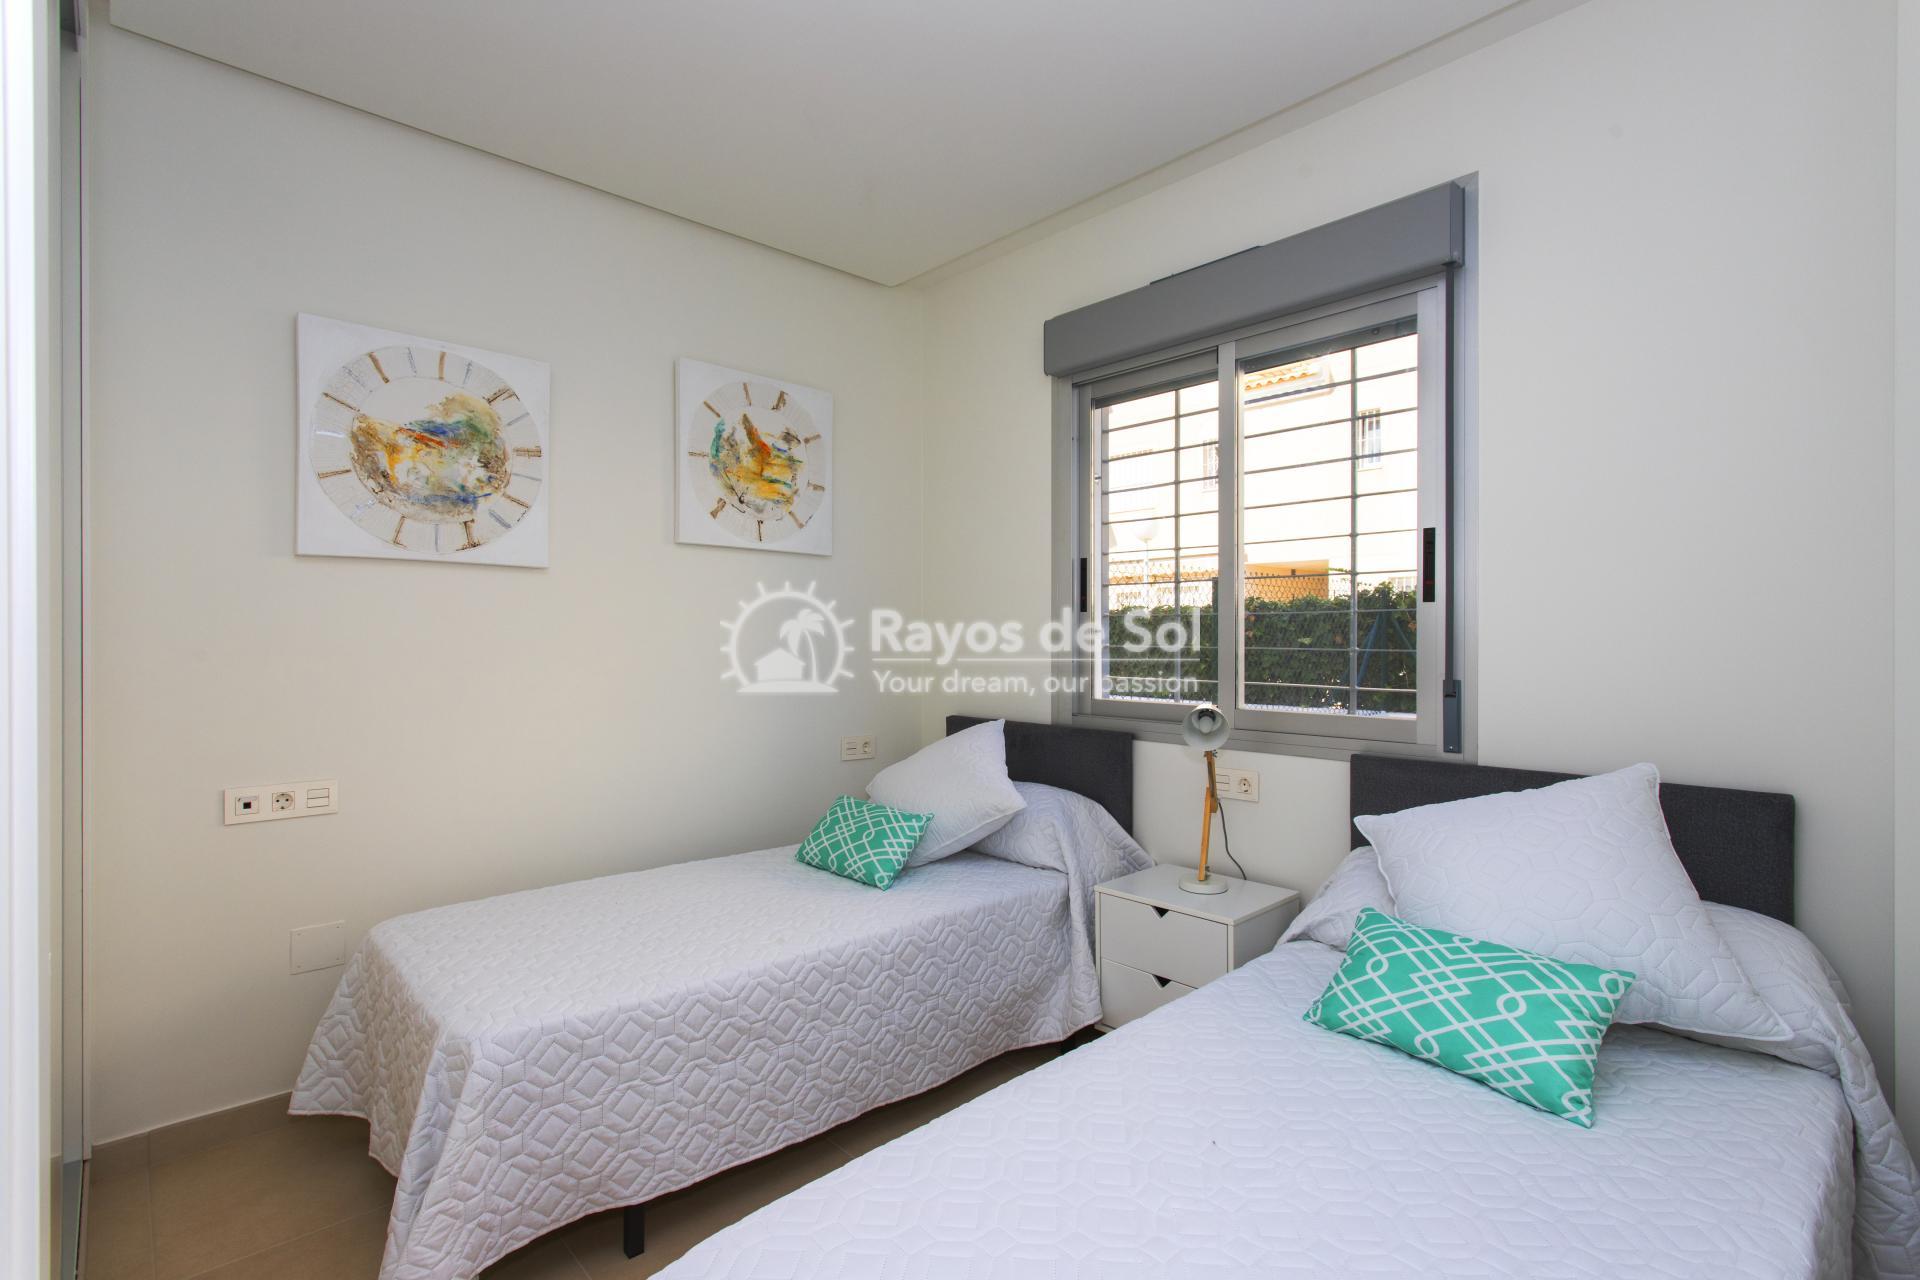 Appartement begane grond  in La Florida, Orihuela Costa, Costa Blanca (Oasis place BG3-2) - 12